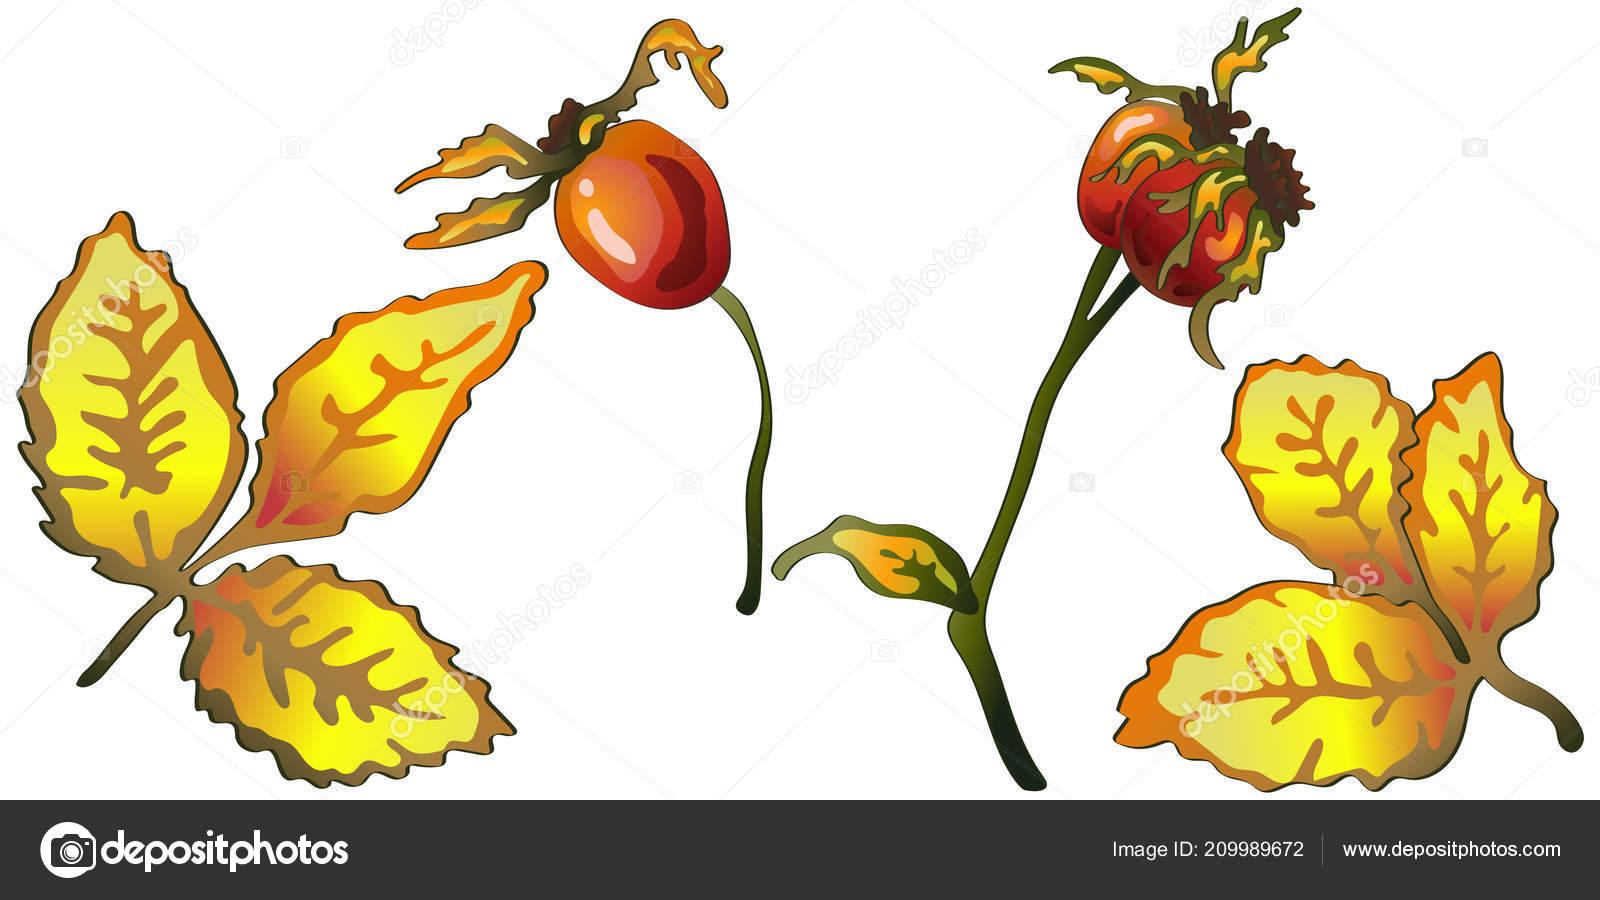 Vector Automne Feuilles Jaune Rose Musquee Plantes Feuillage Floral